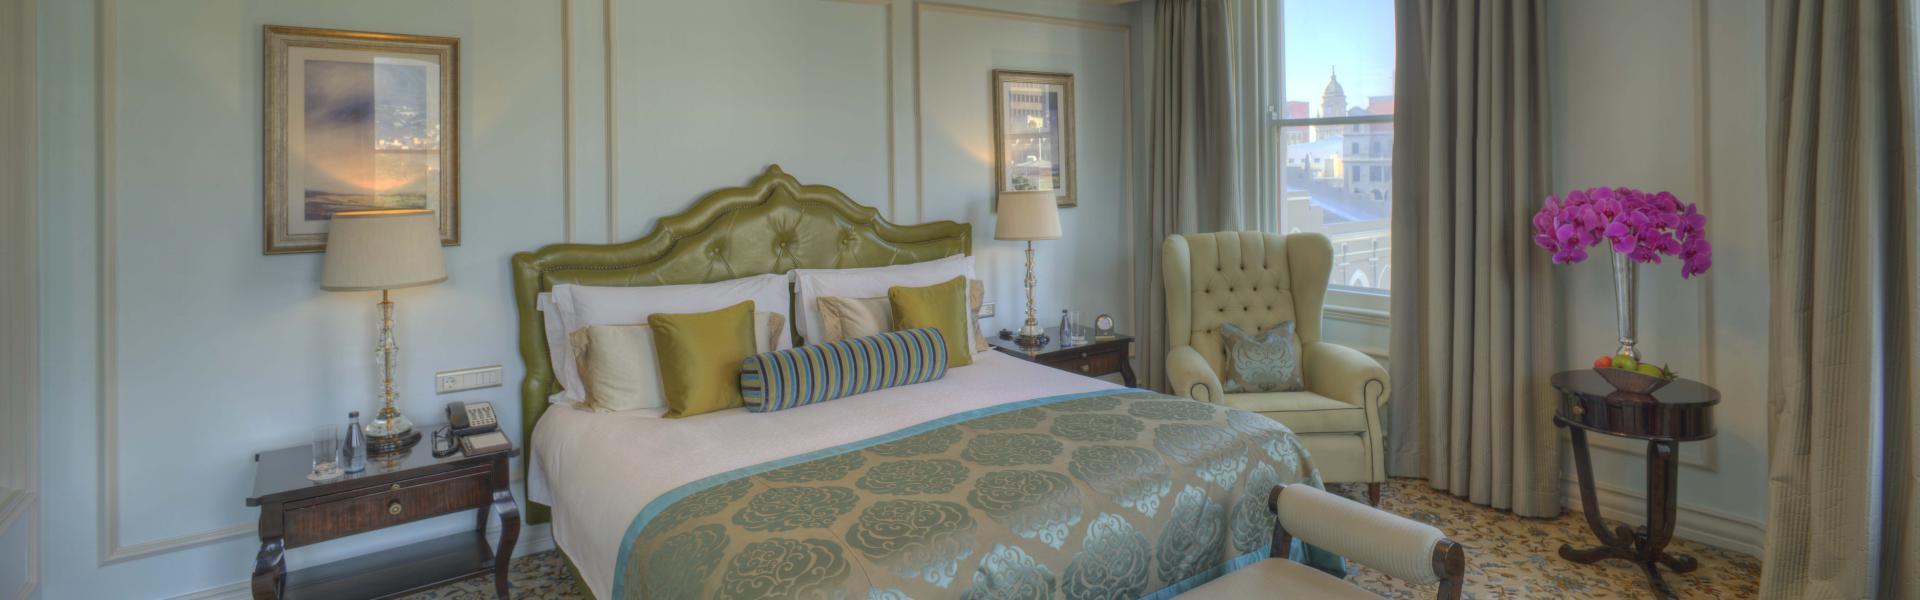 Heritage Bedroom at Taj Cape Town, Centre, Cape Town